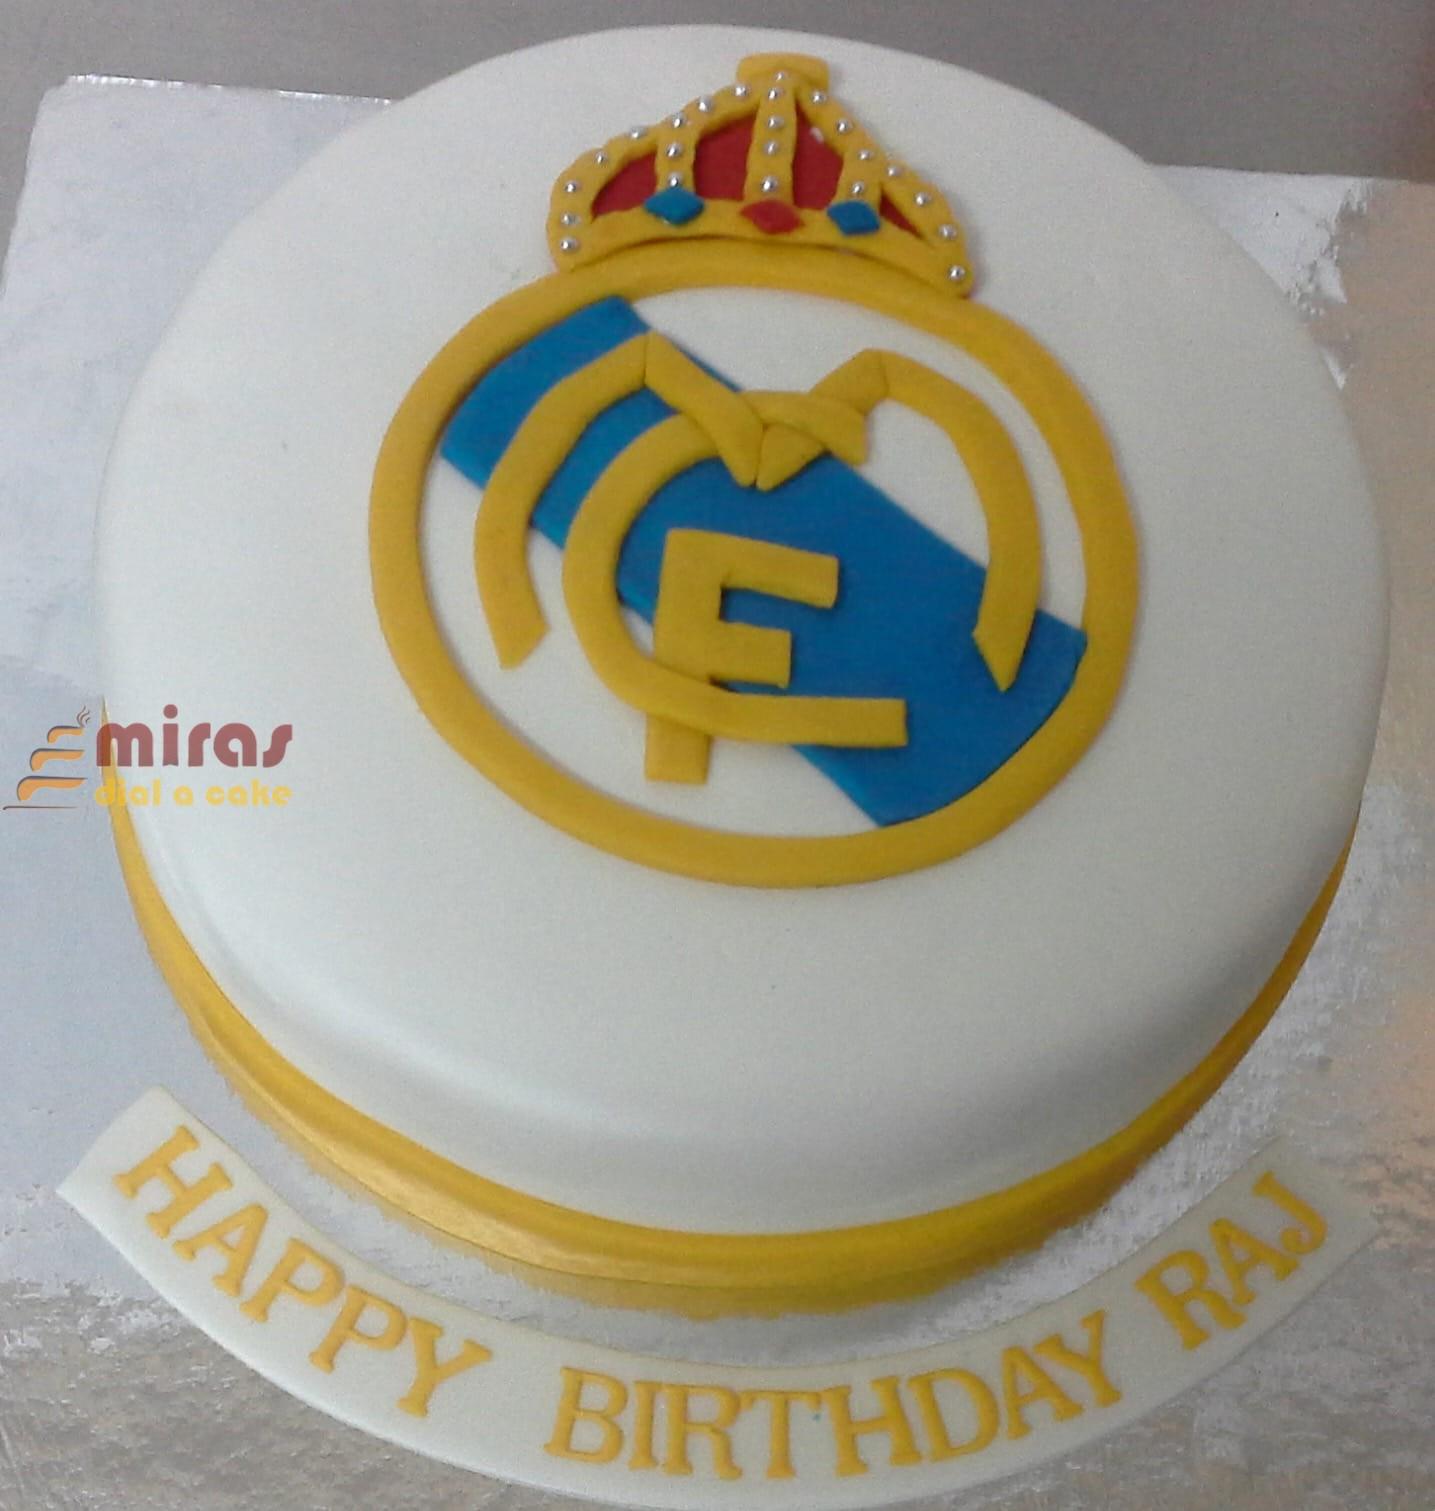 Stupendous Online Birthday Cakes Order Football Theme Birthday Cake For Funny Birthday Cards Online Elaedamsfinfo